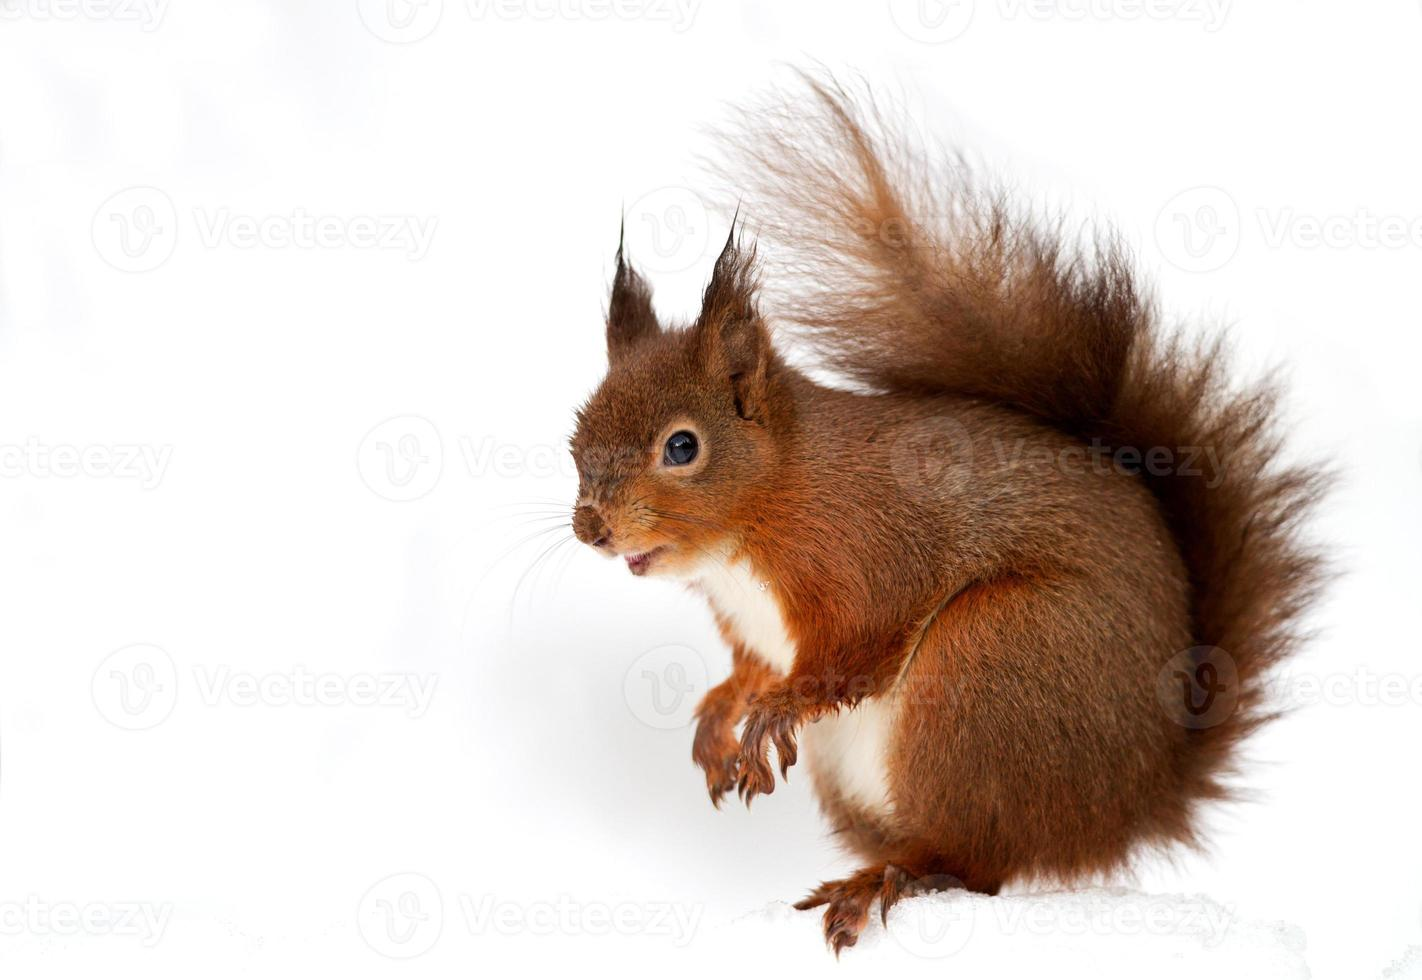 rotes Eichhörnchen (Sciurus vulgaris) foto